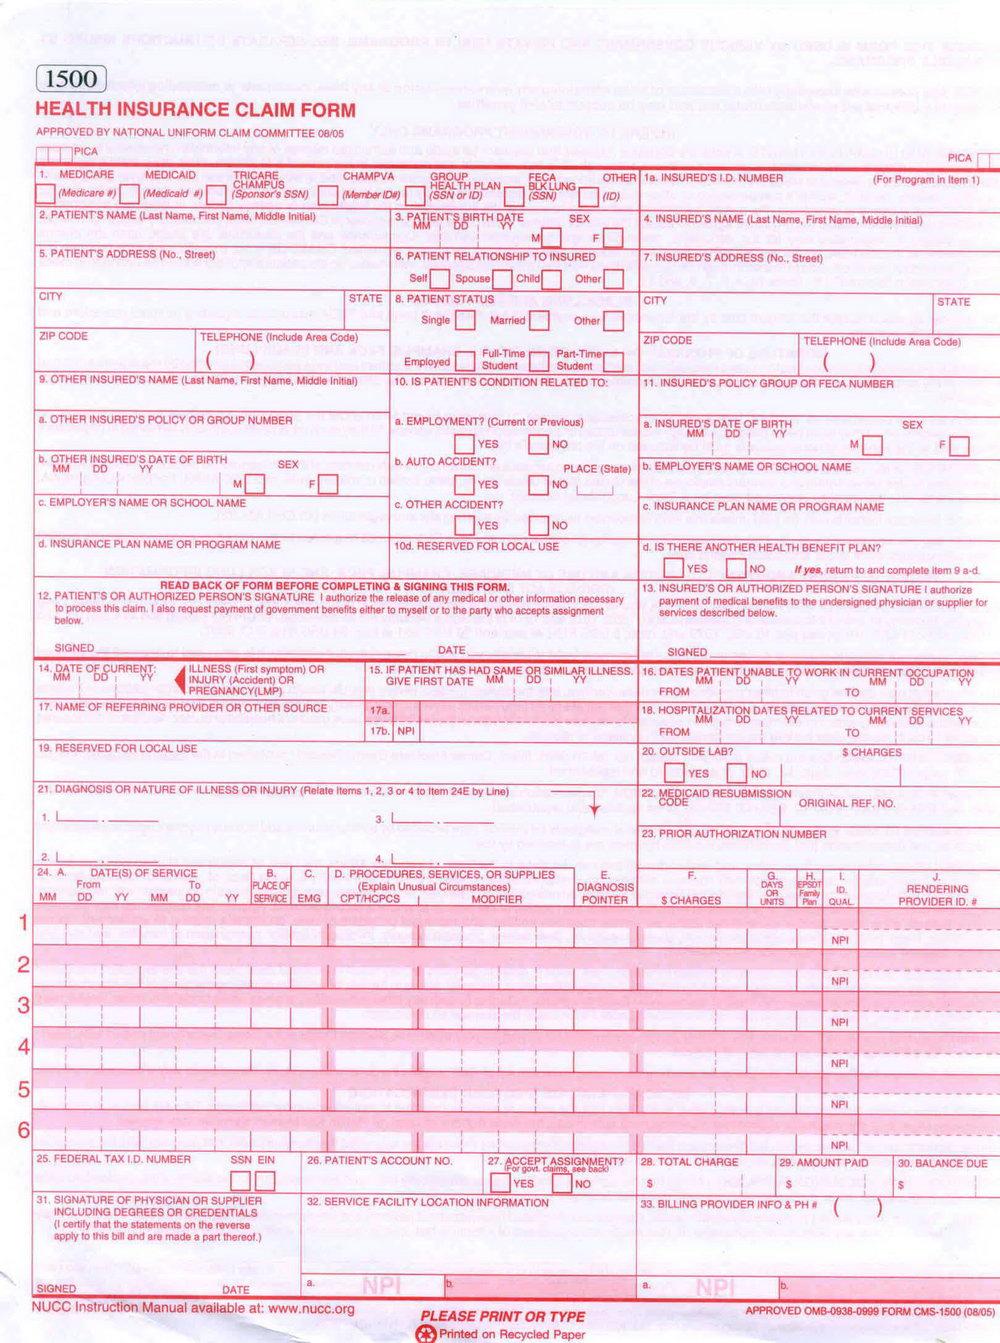 Printable Cms 1500 Form 02 12